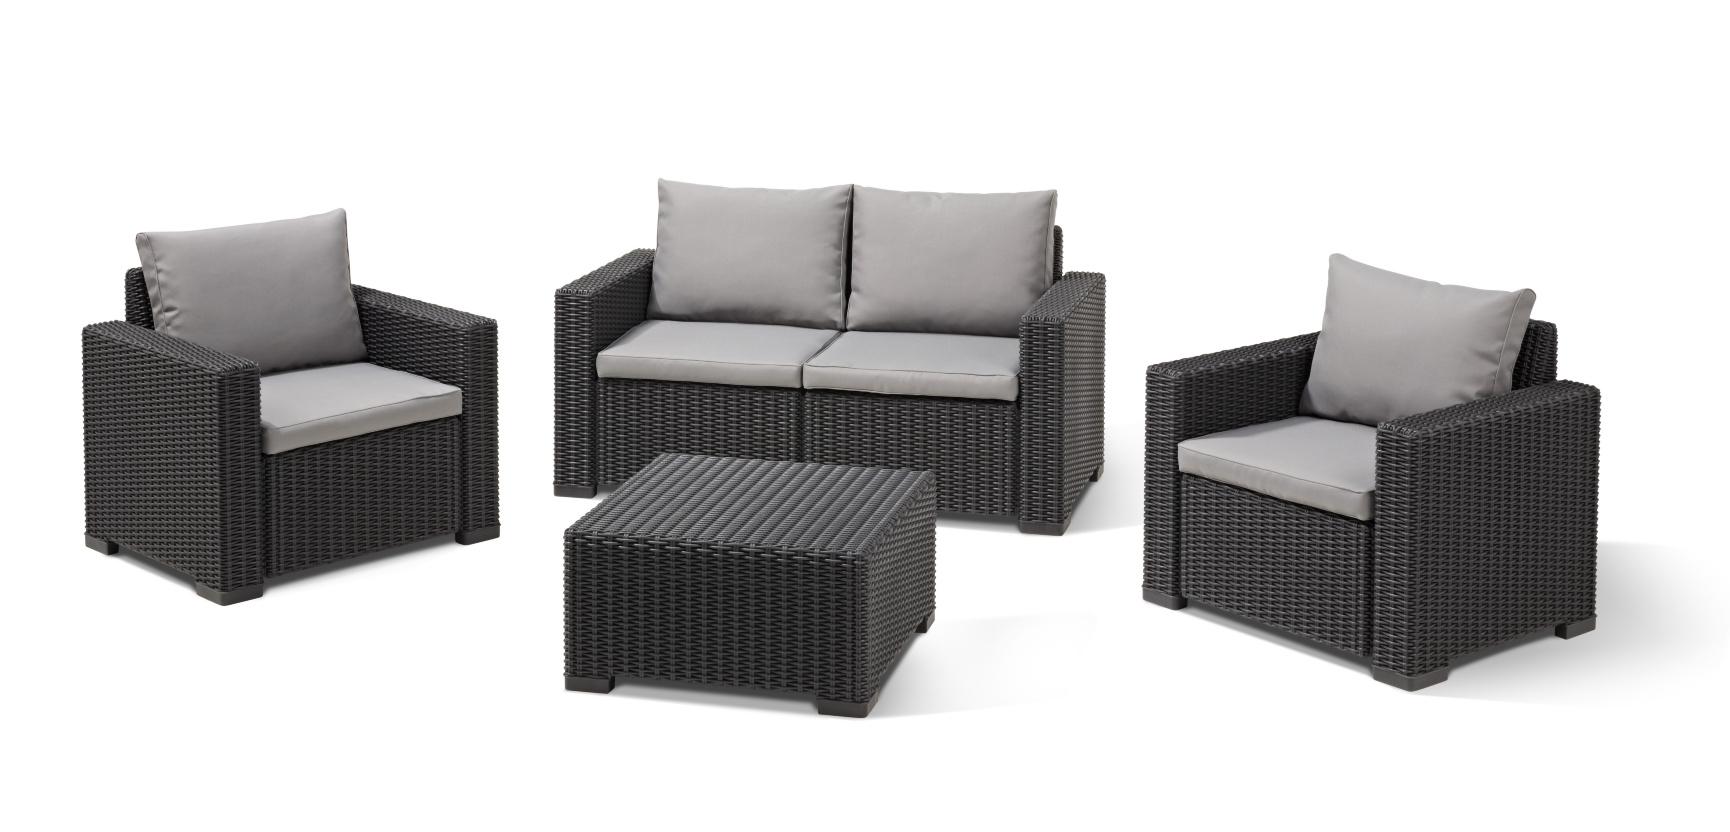 Lounge Sets allibert california lounge set graphite two seater allibert